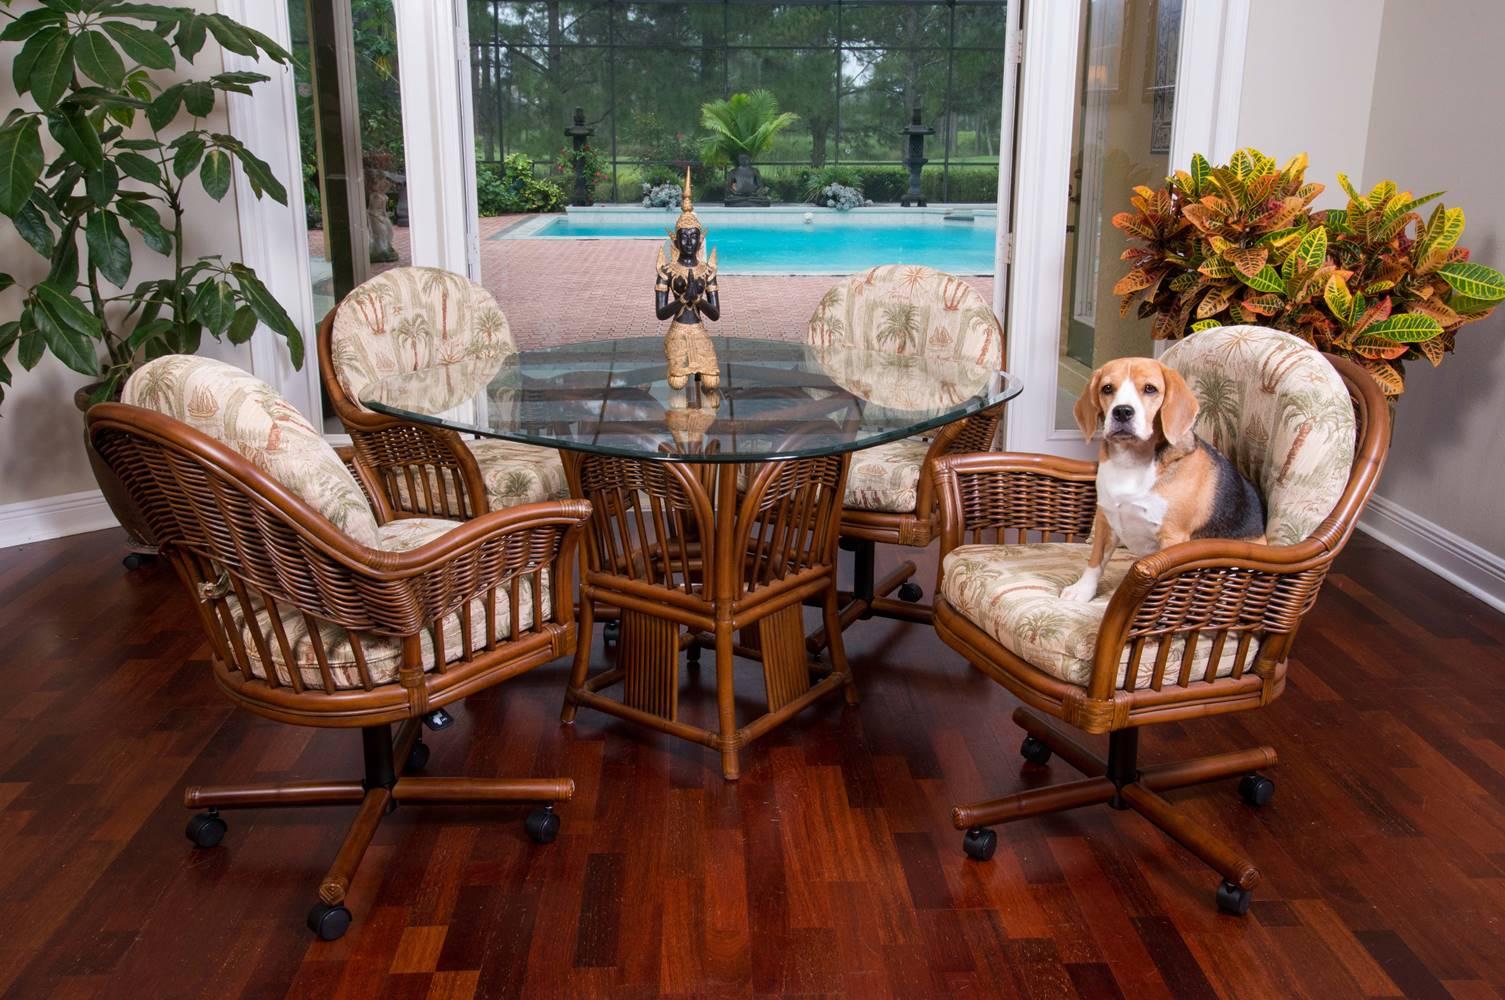 Bridgeport Tilt Swivel Caster Chair - Sienna Finish & Bridgeport Dining Set - Sienna Finish - Wicker One Imports - Your ...